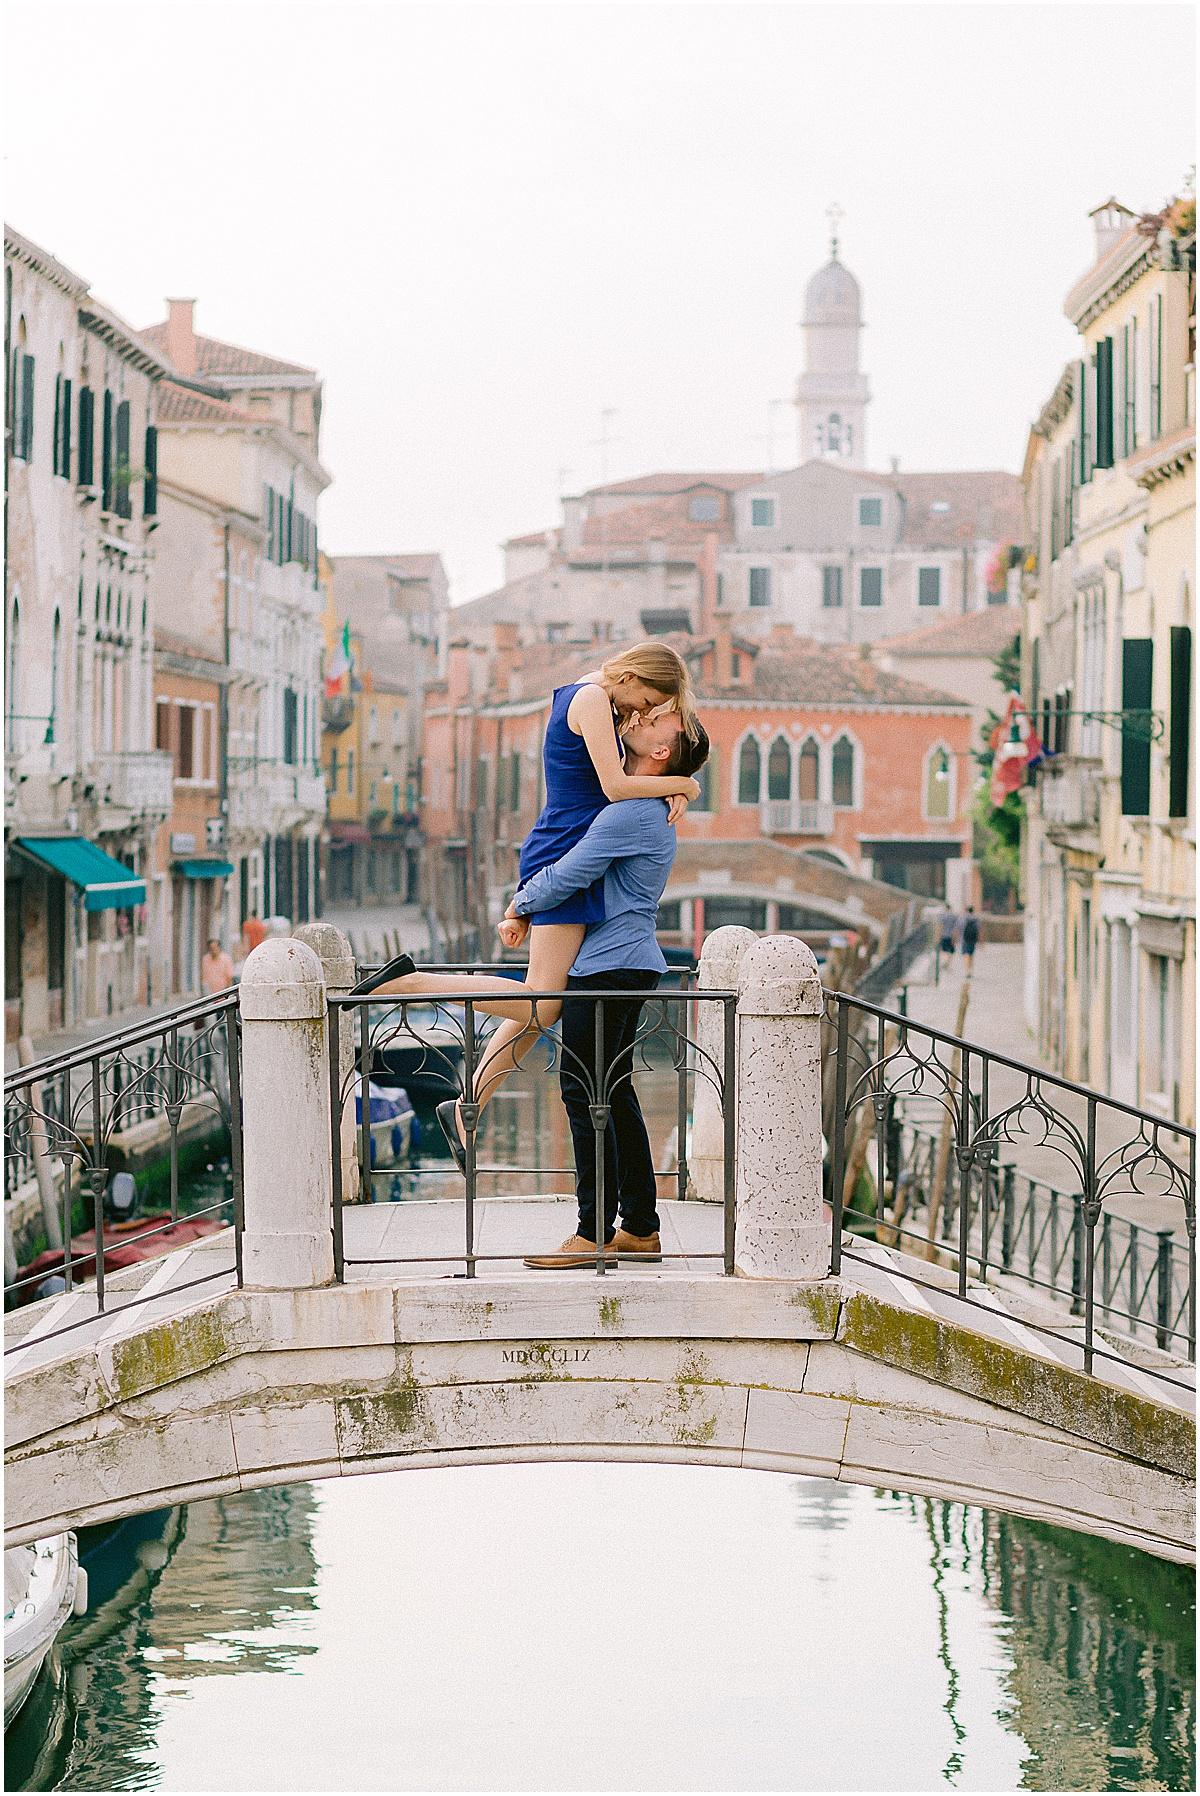 lifestyle-portrait-photography-couple-in-venice-gondola-sunrise-stefano-degirmenci_0229.jpg